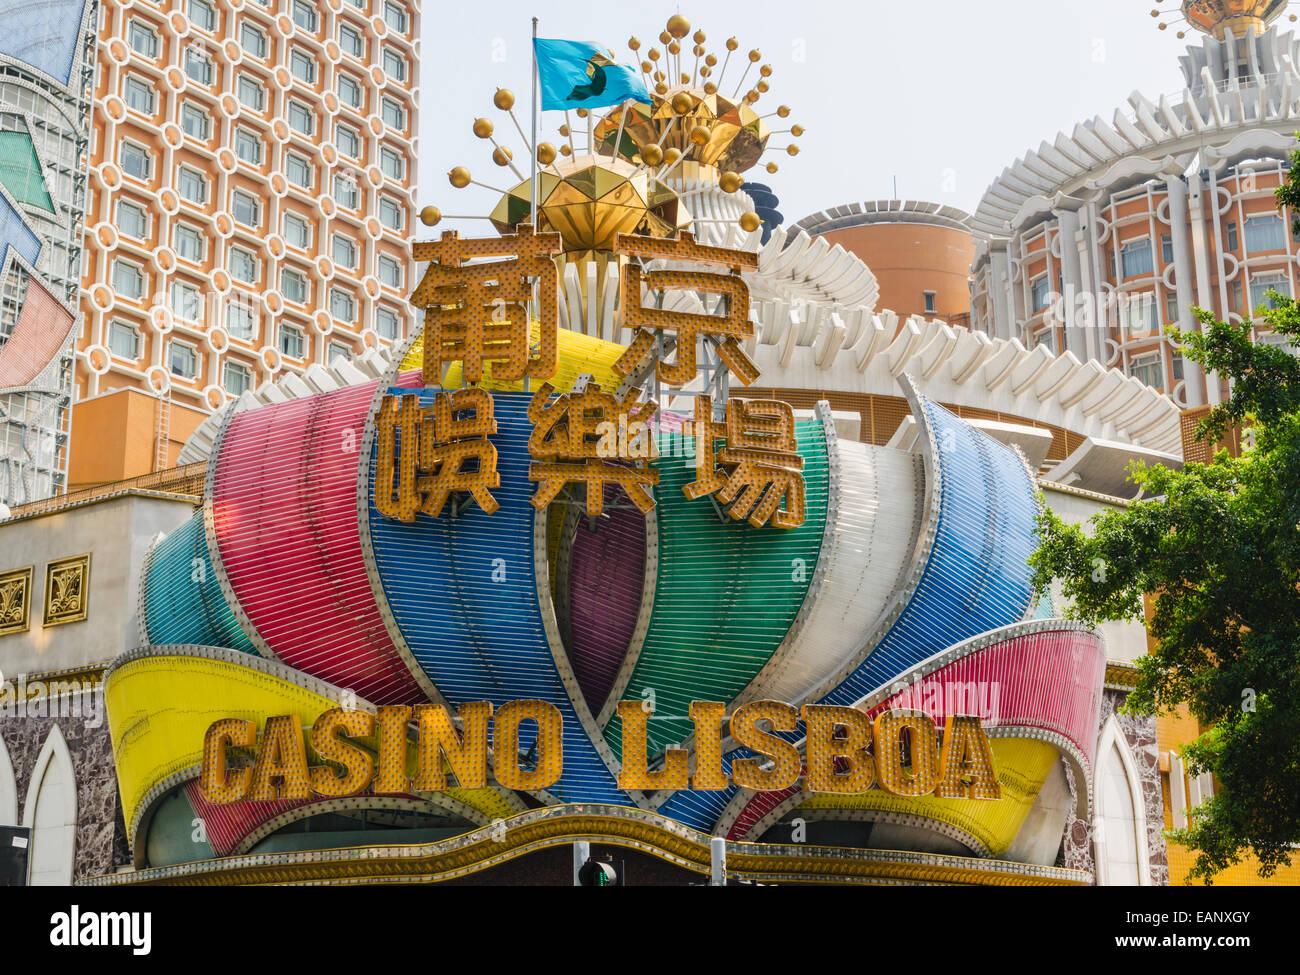 Entrée du Casino Lisboa, Macau, Chine Photo Stock